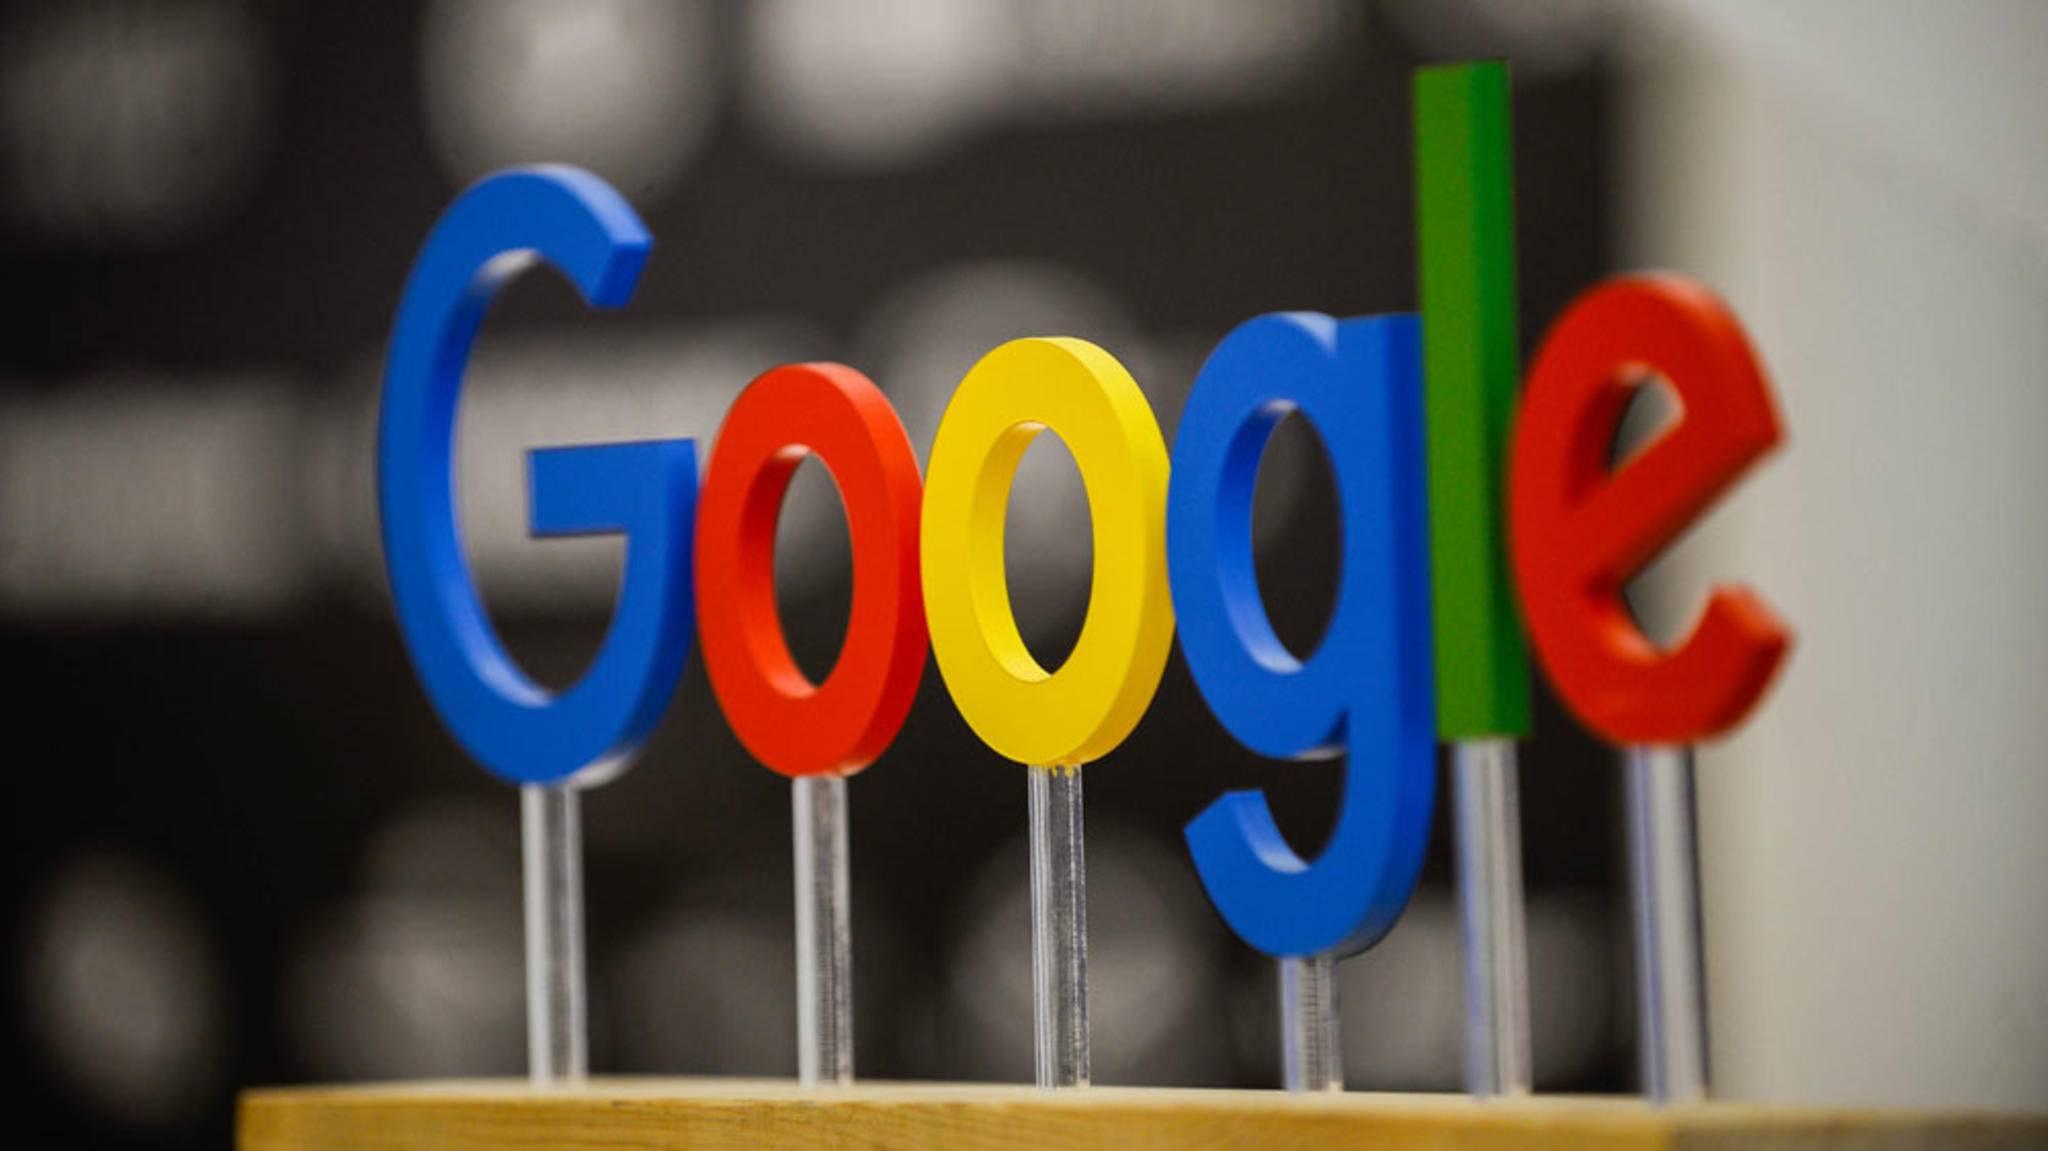 Hinter den Farben des Google-Logos steckt eine bestimmte Botschaft.